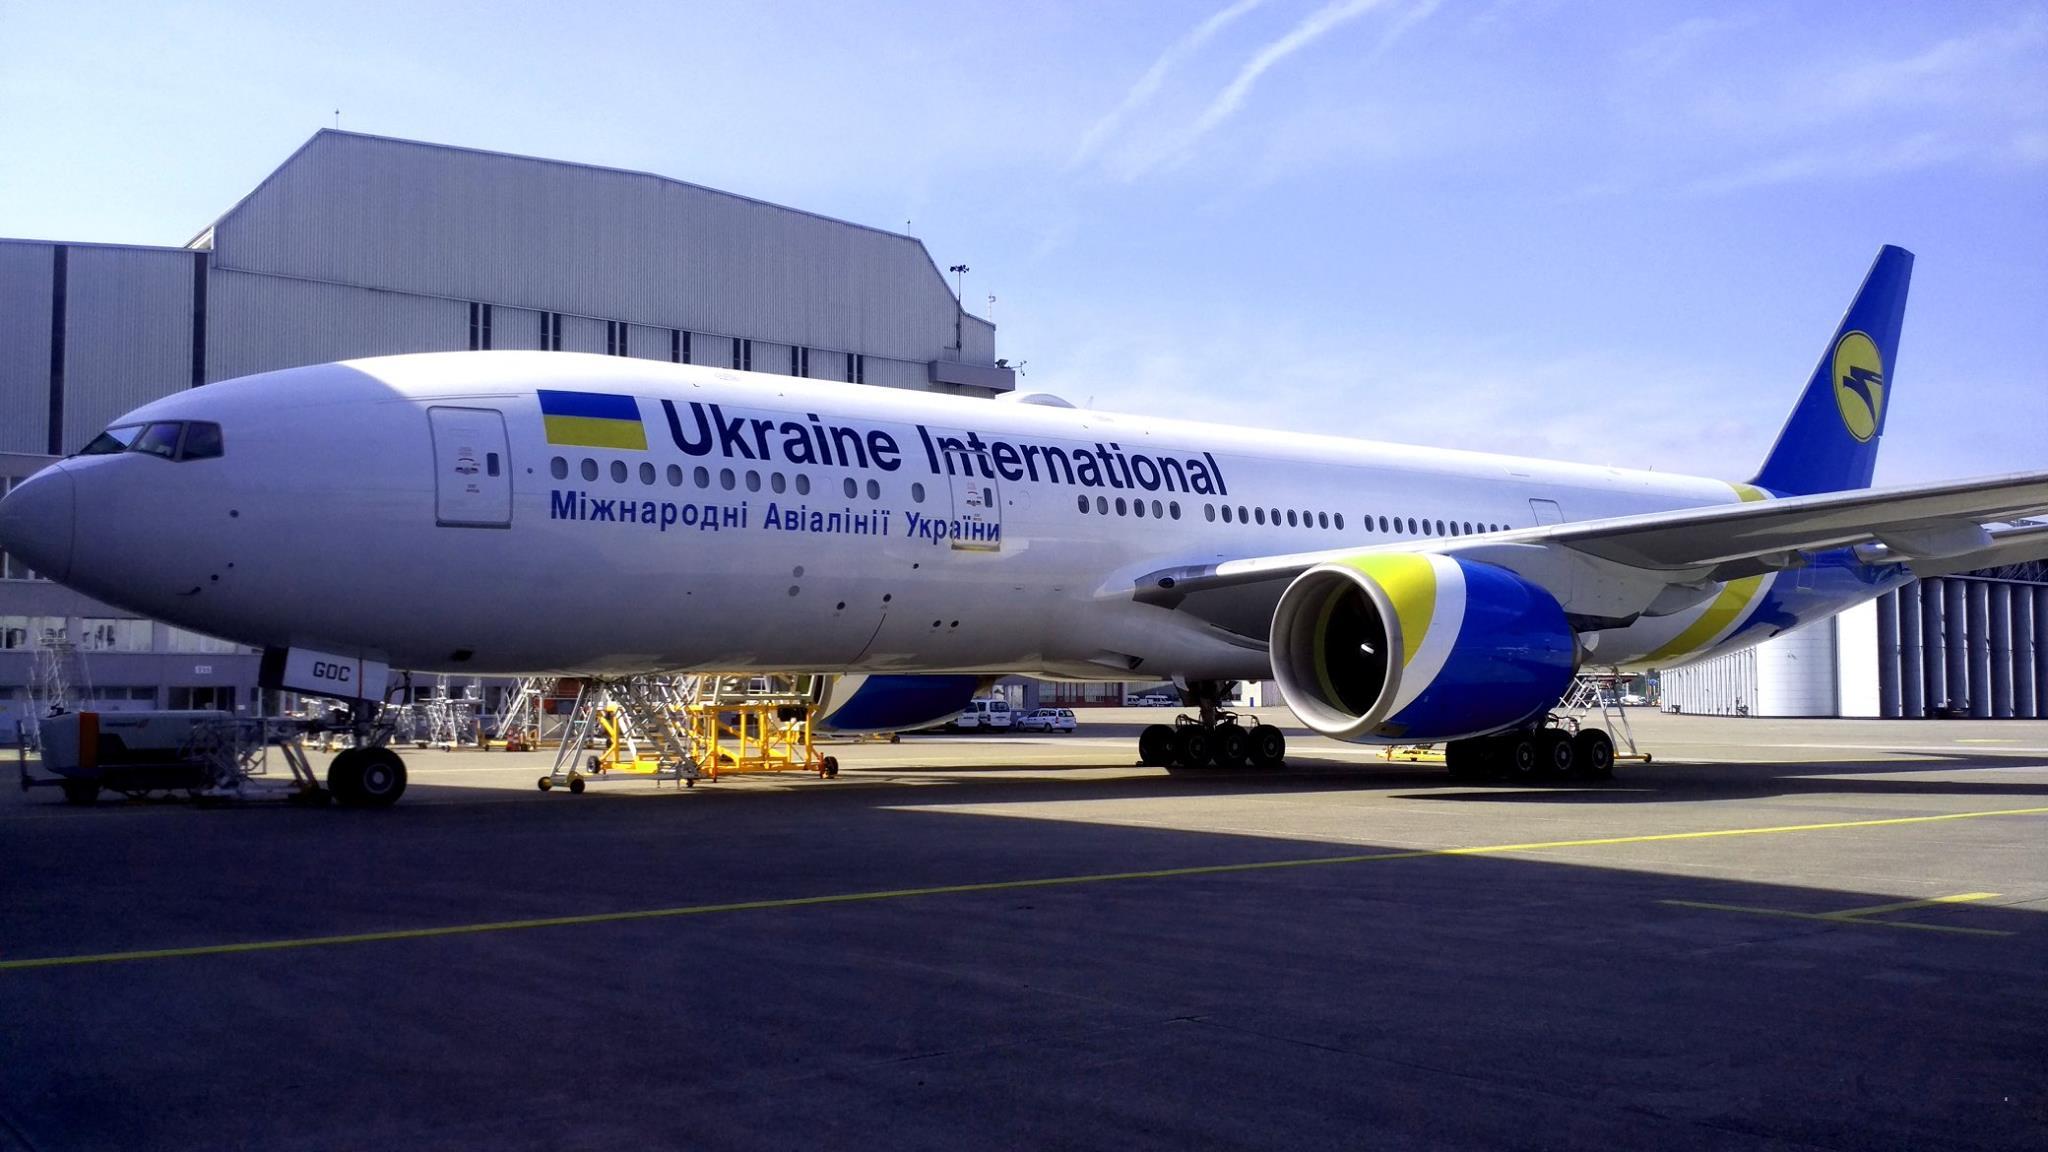 Boeing 777 авиакомпании МАУ. Фото со страницы авиакомпании в Facebook